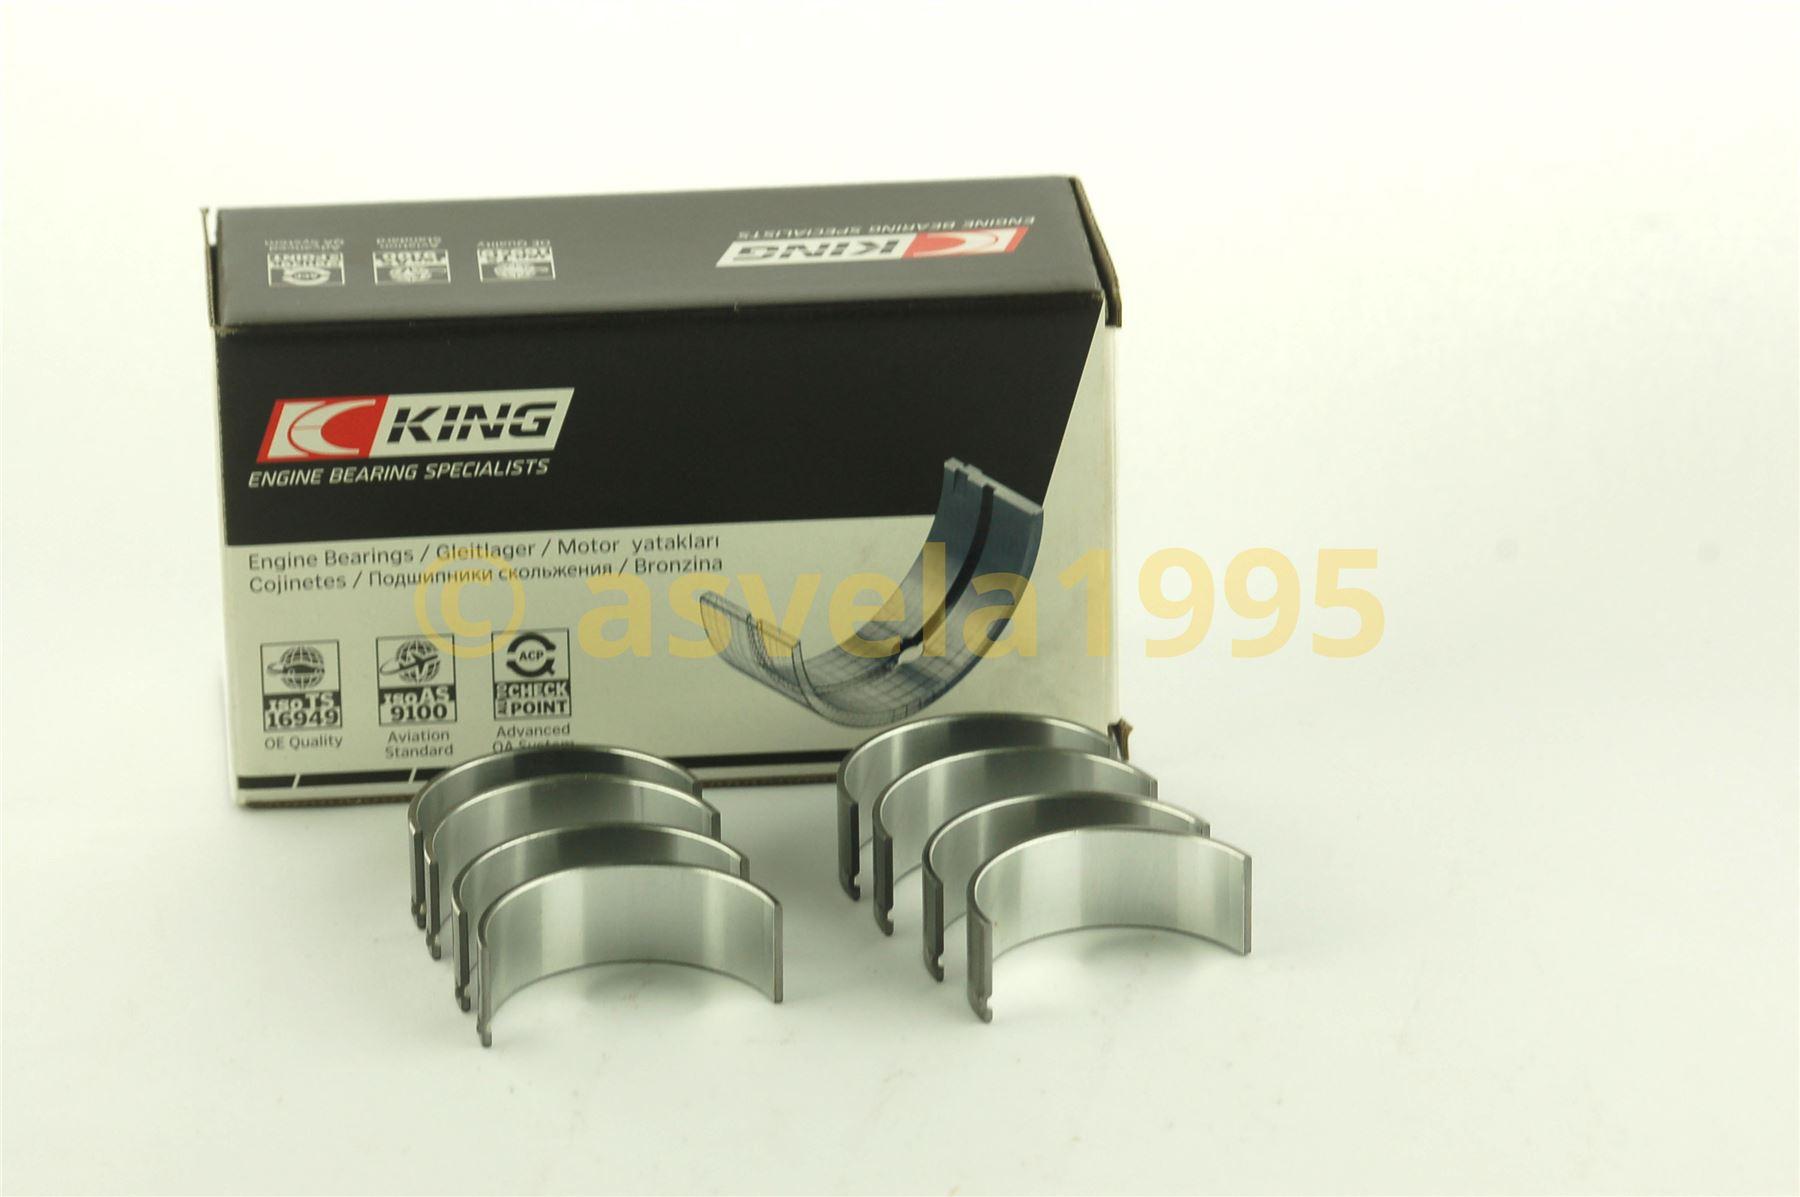 King Big End Con Rod Bearings CR4262SI 0.25 Oversize For SUZUKI 1.8-2.0 J18-J20